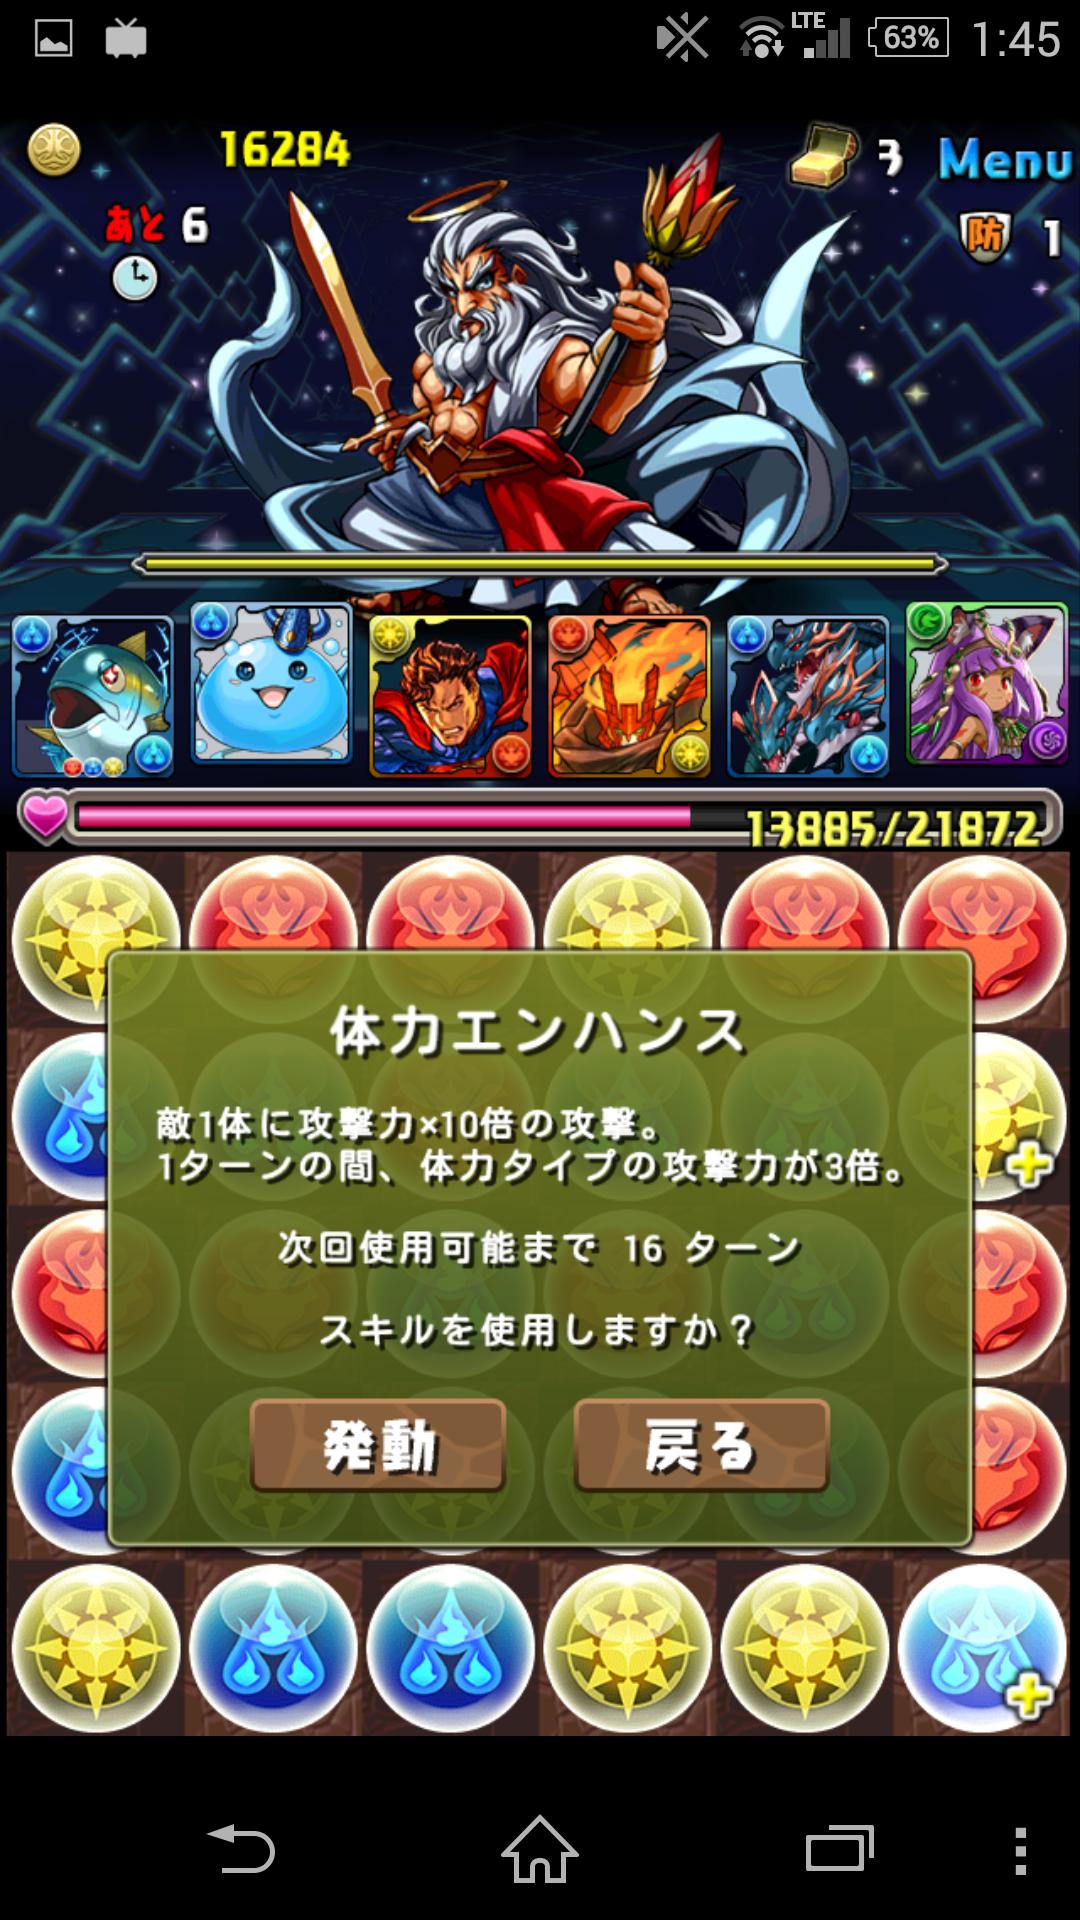 Screenshot_2014-11-13-01-45-17.png